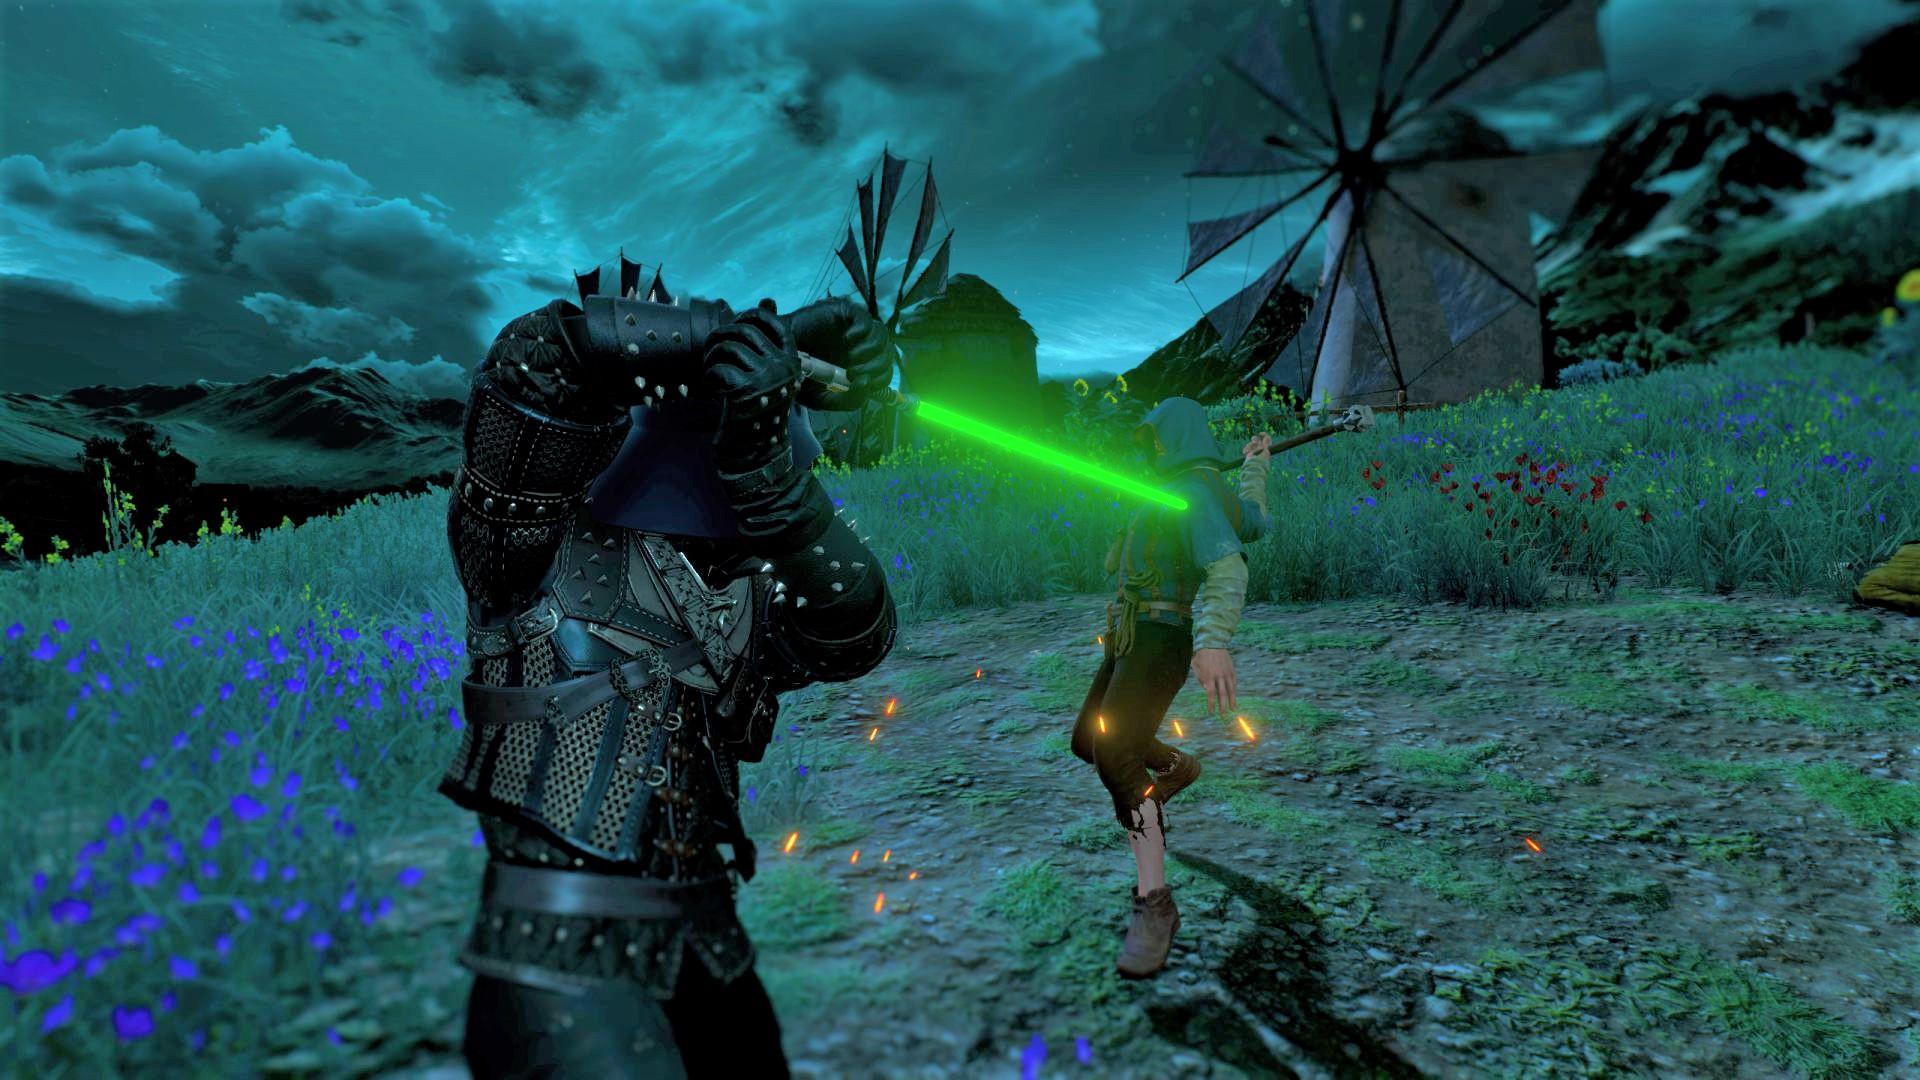 This Witcher 3 mod gives Geralt a Star Wars lightsaber